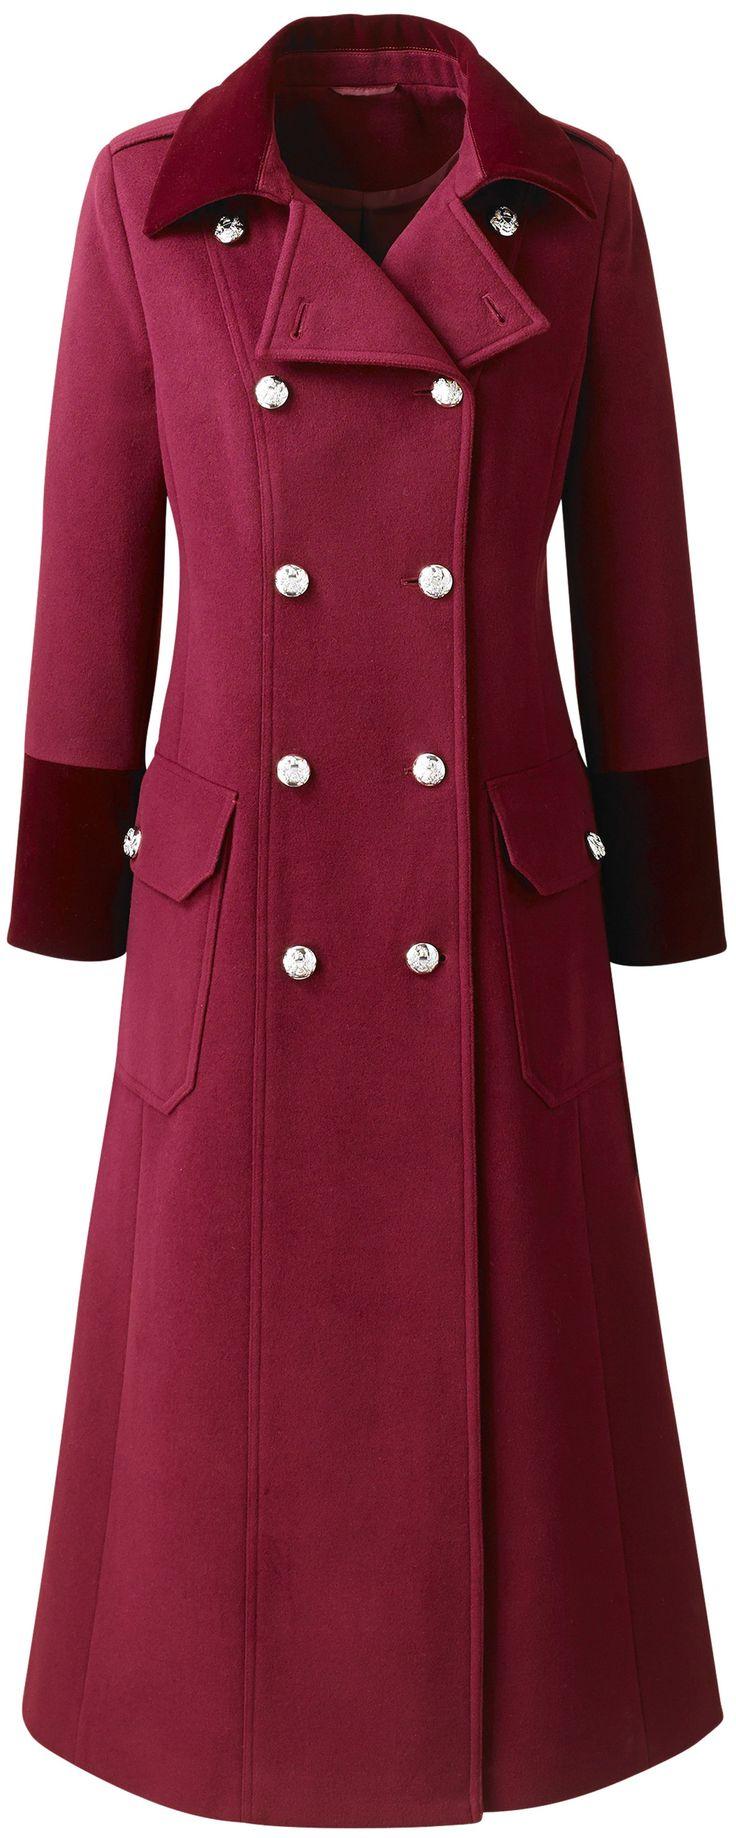 17 Best ideas about Cute Coats on Pinterest | Coats